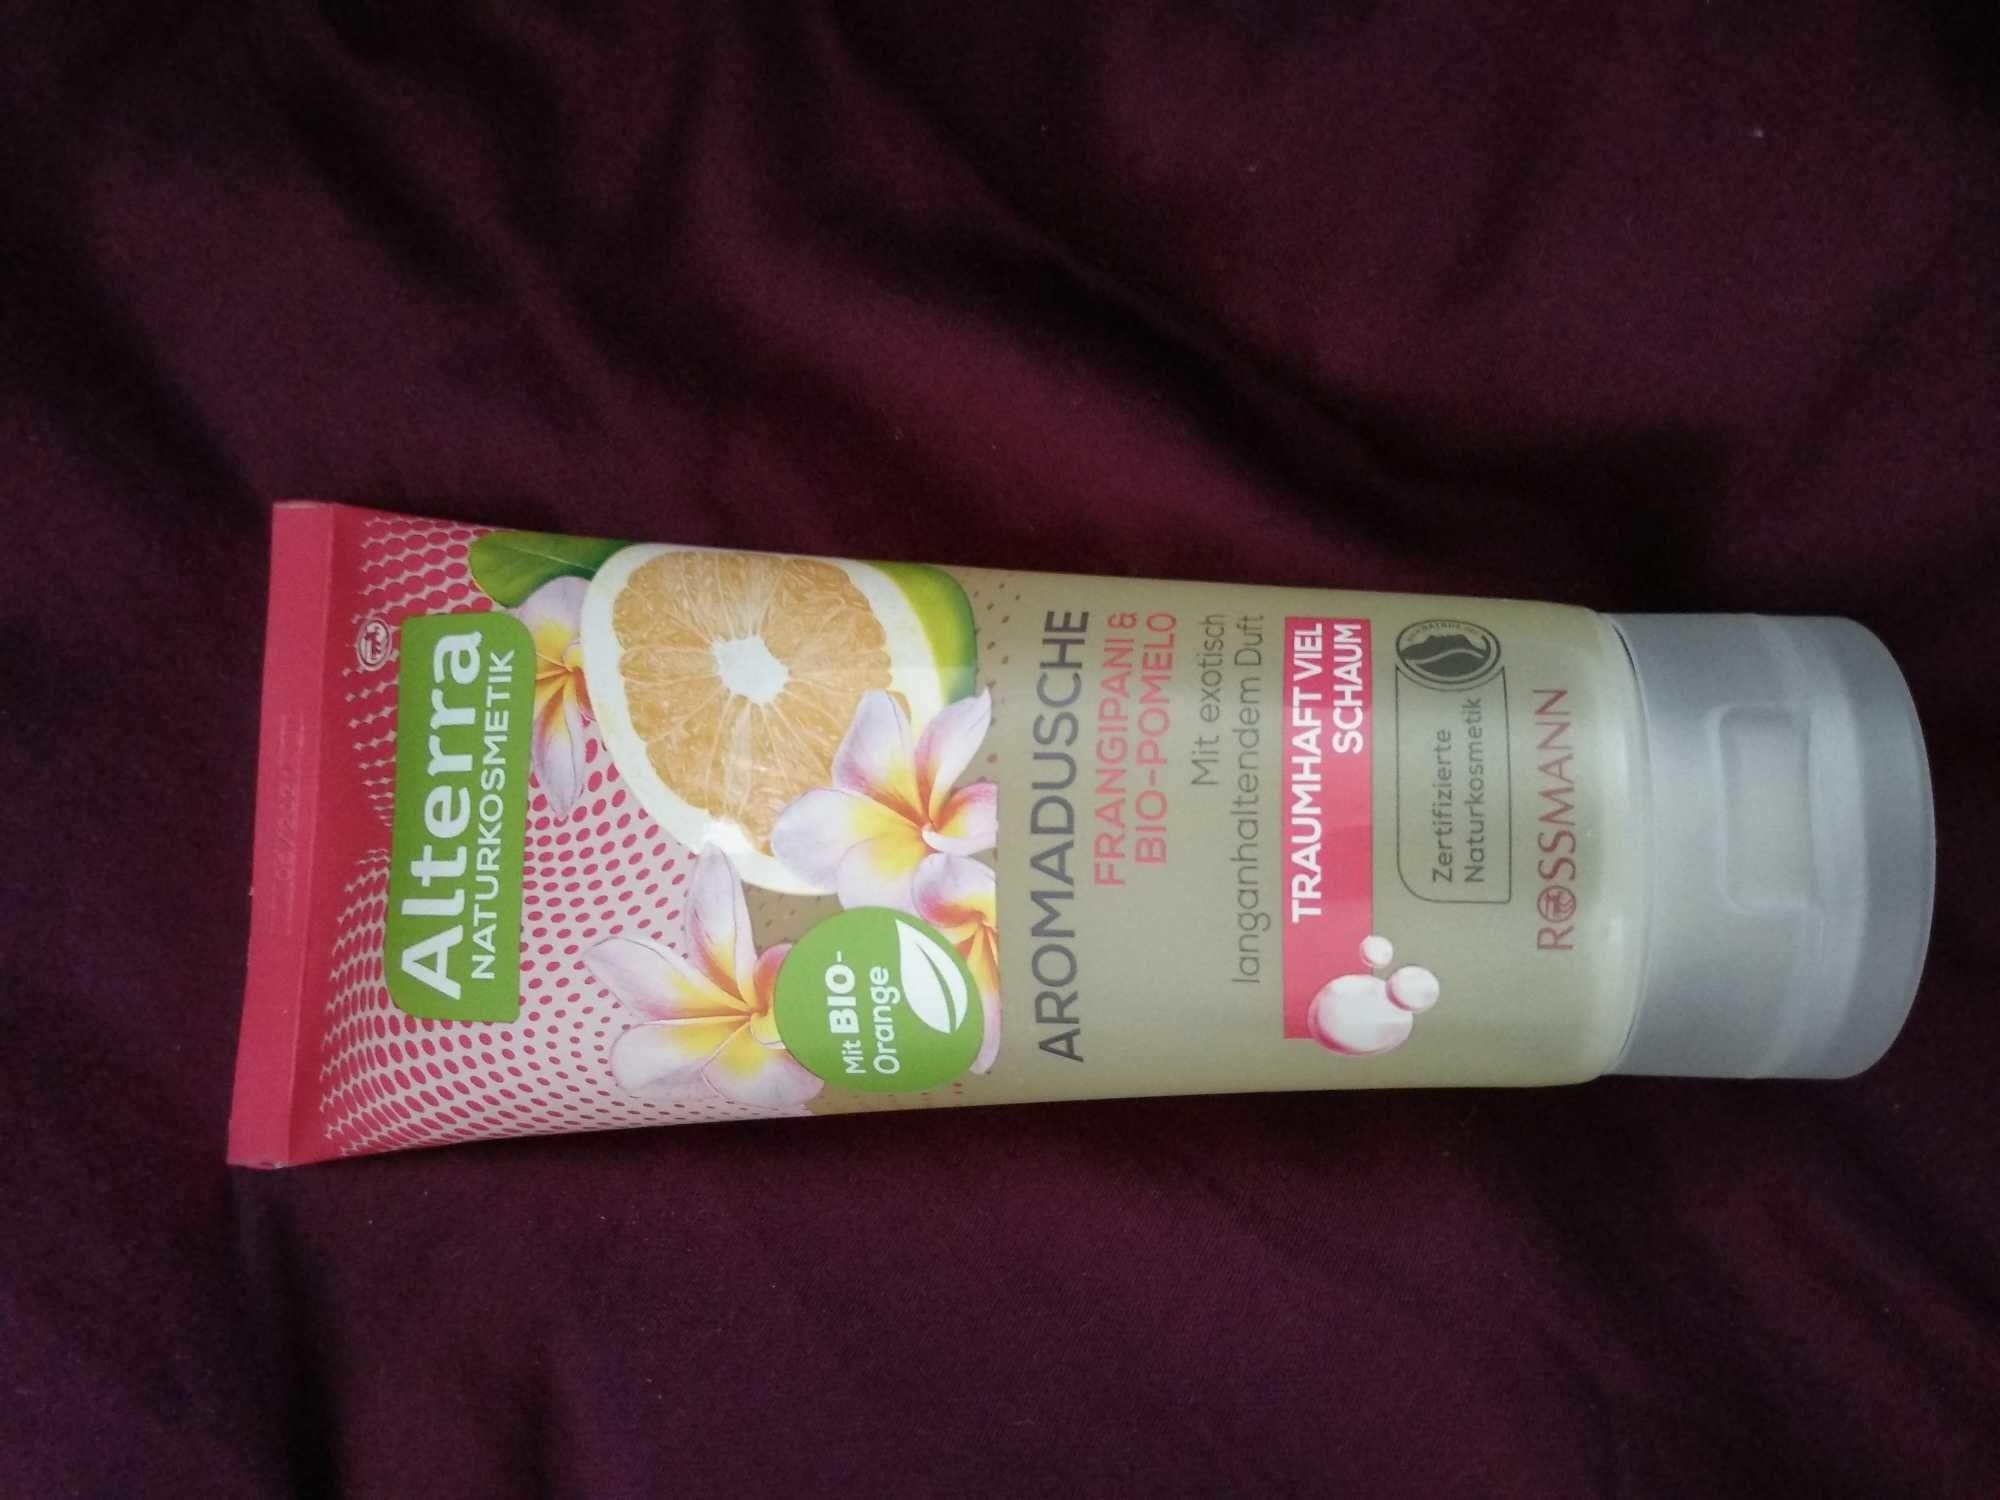 Aromadusche frangipani & bio-pomelo - Product - en